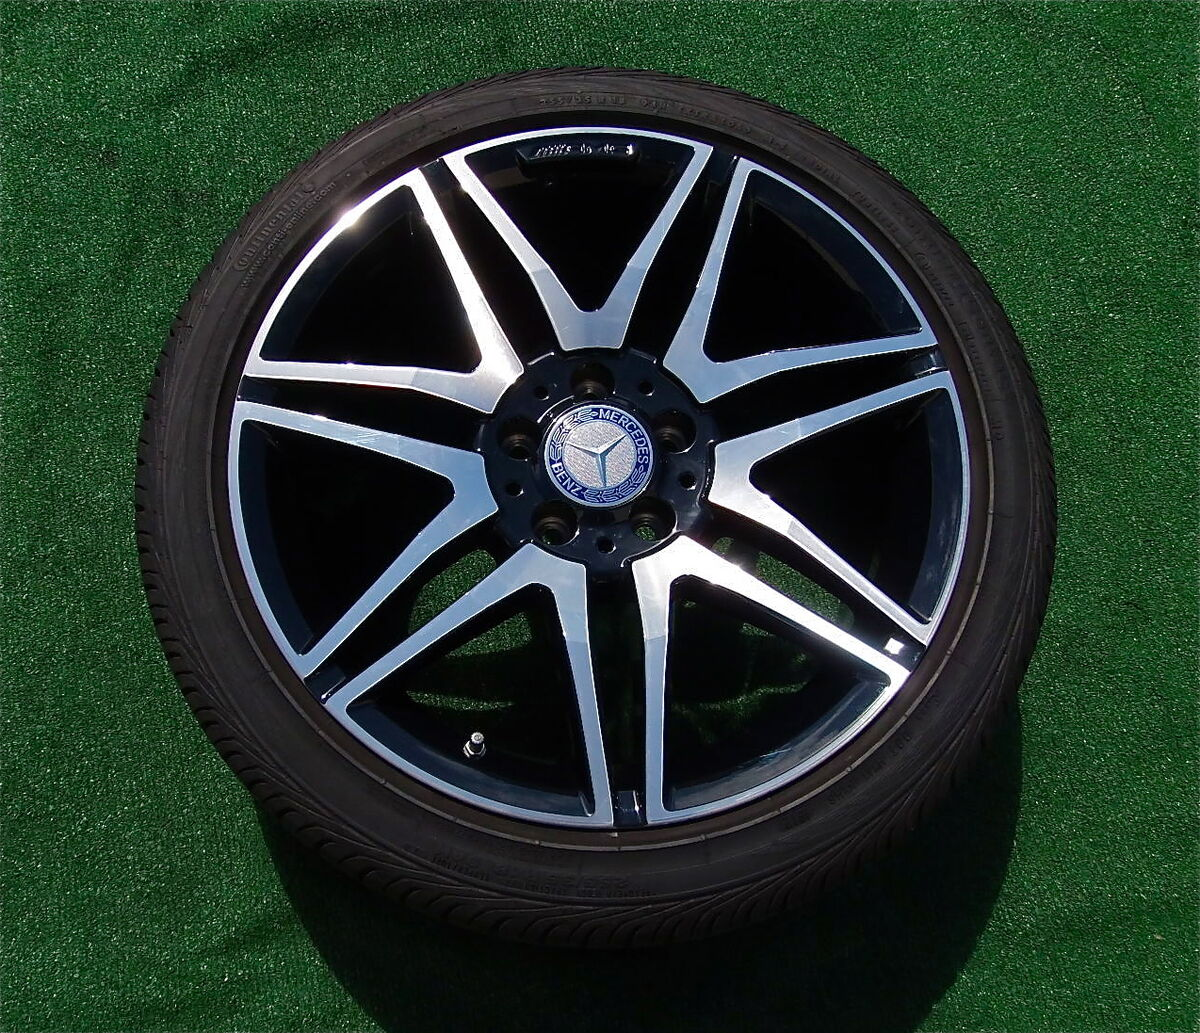 4 New 2013 Mercedes Benz AMG 18 inch Black Wheels Tires TPMS C250 C300 C350